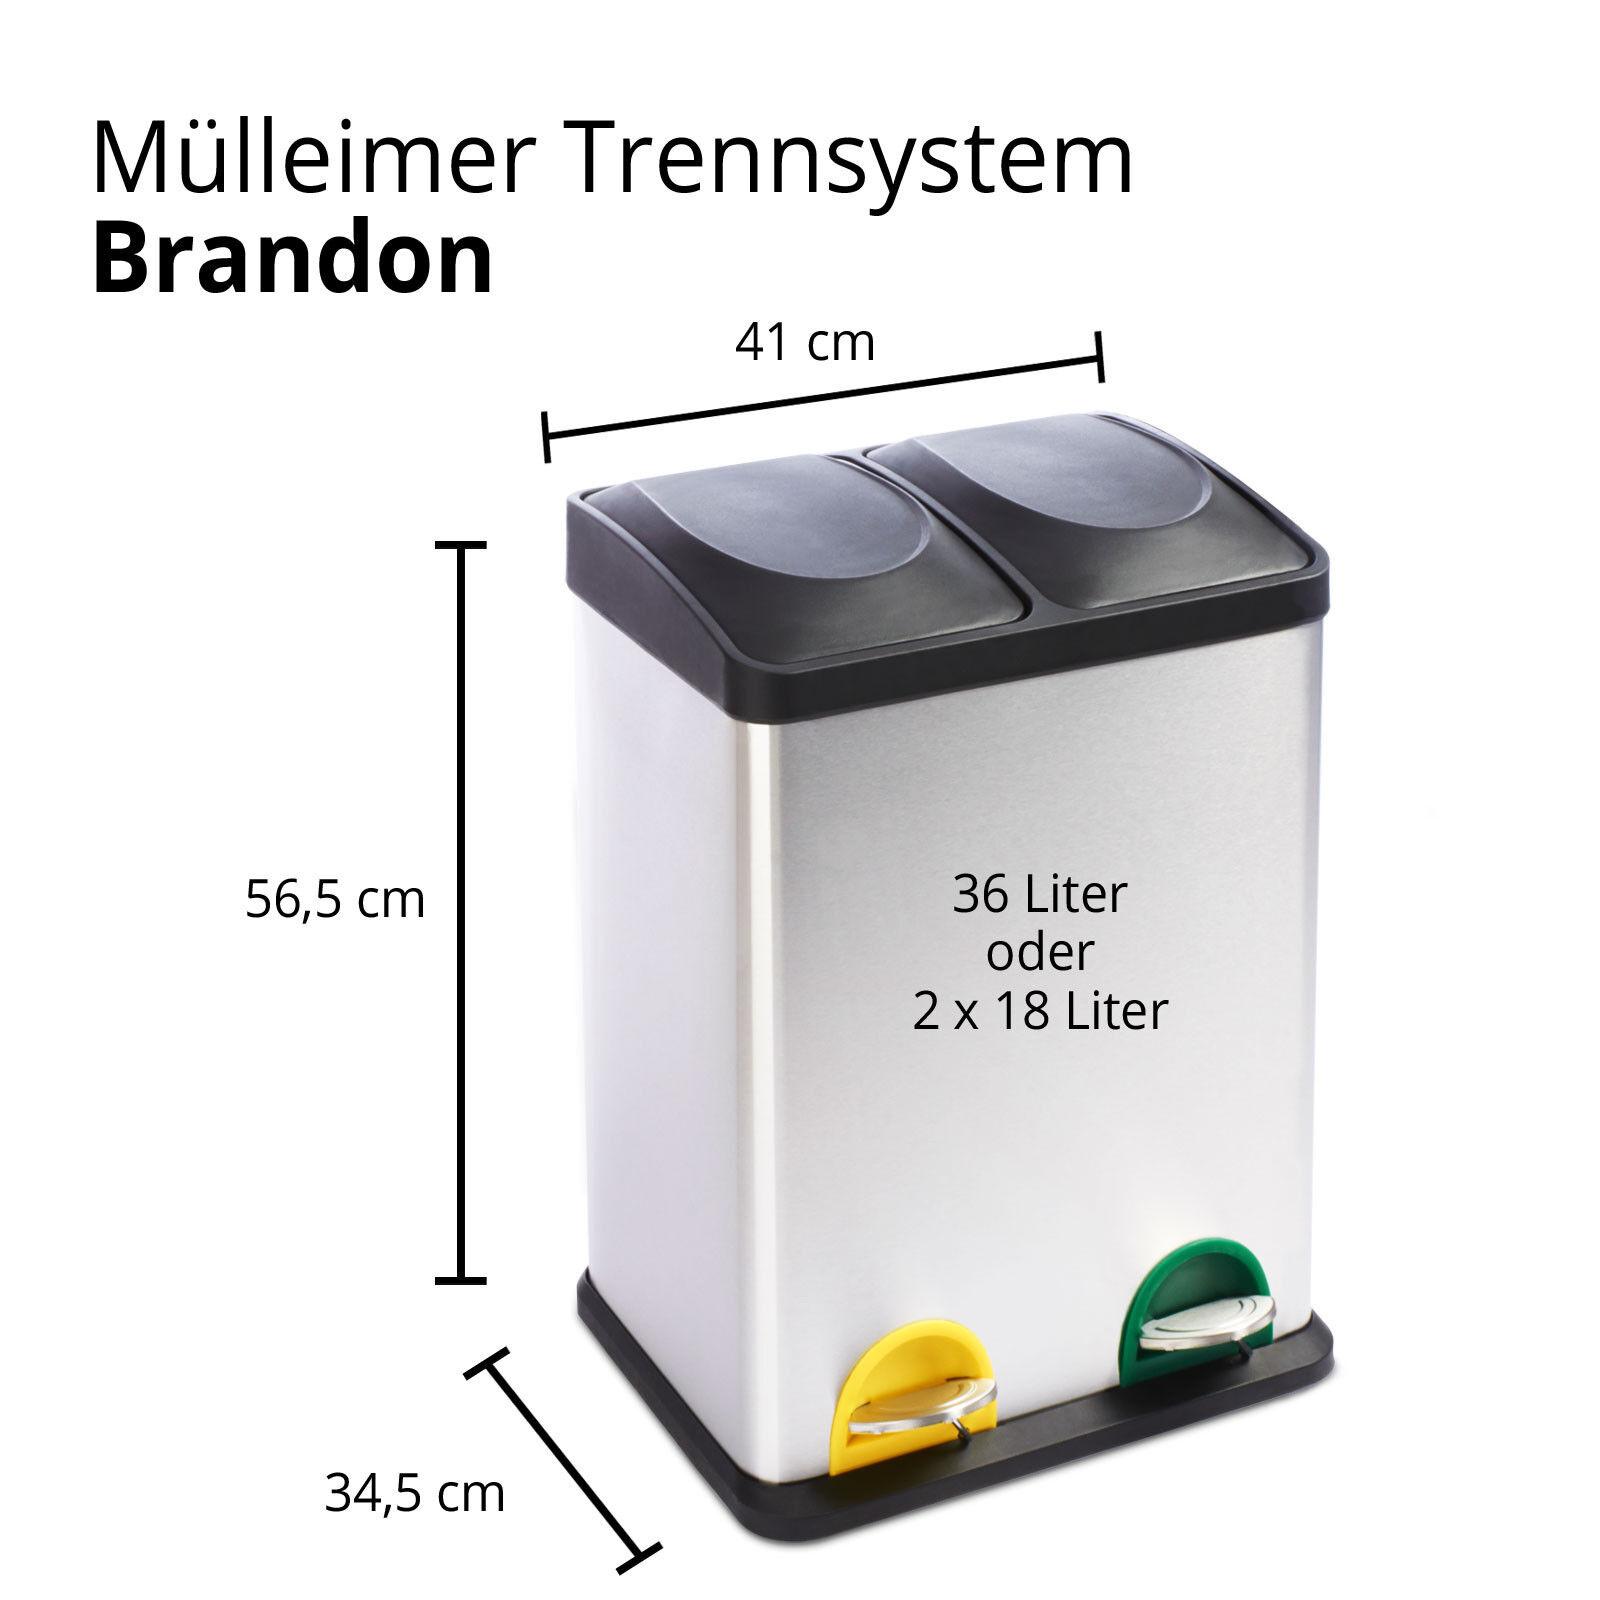 Mülleimer Abfalleimer Trennsystem mit Tretfunktion aus Edelstahl inkl. inkl. inkl. Fussmatte b2c7fc